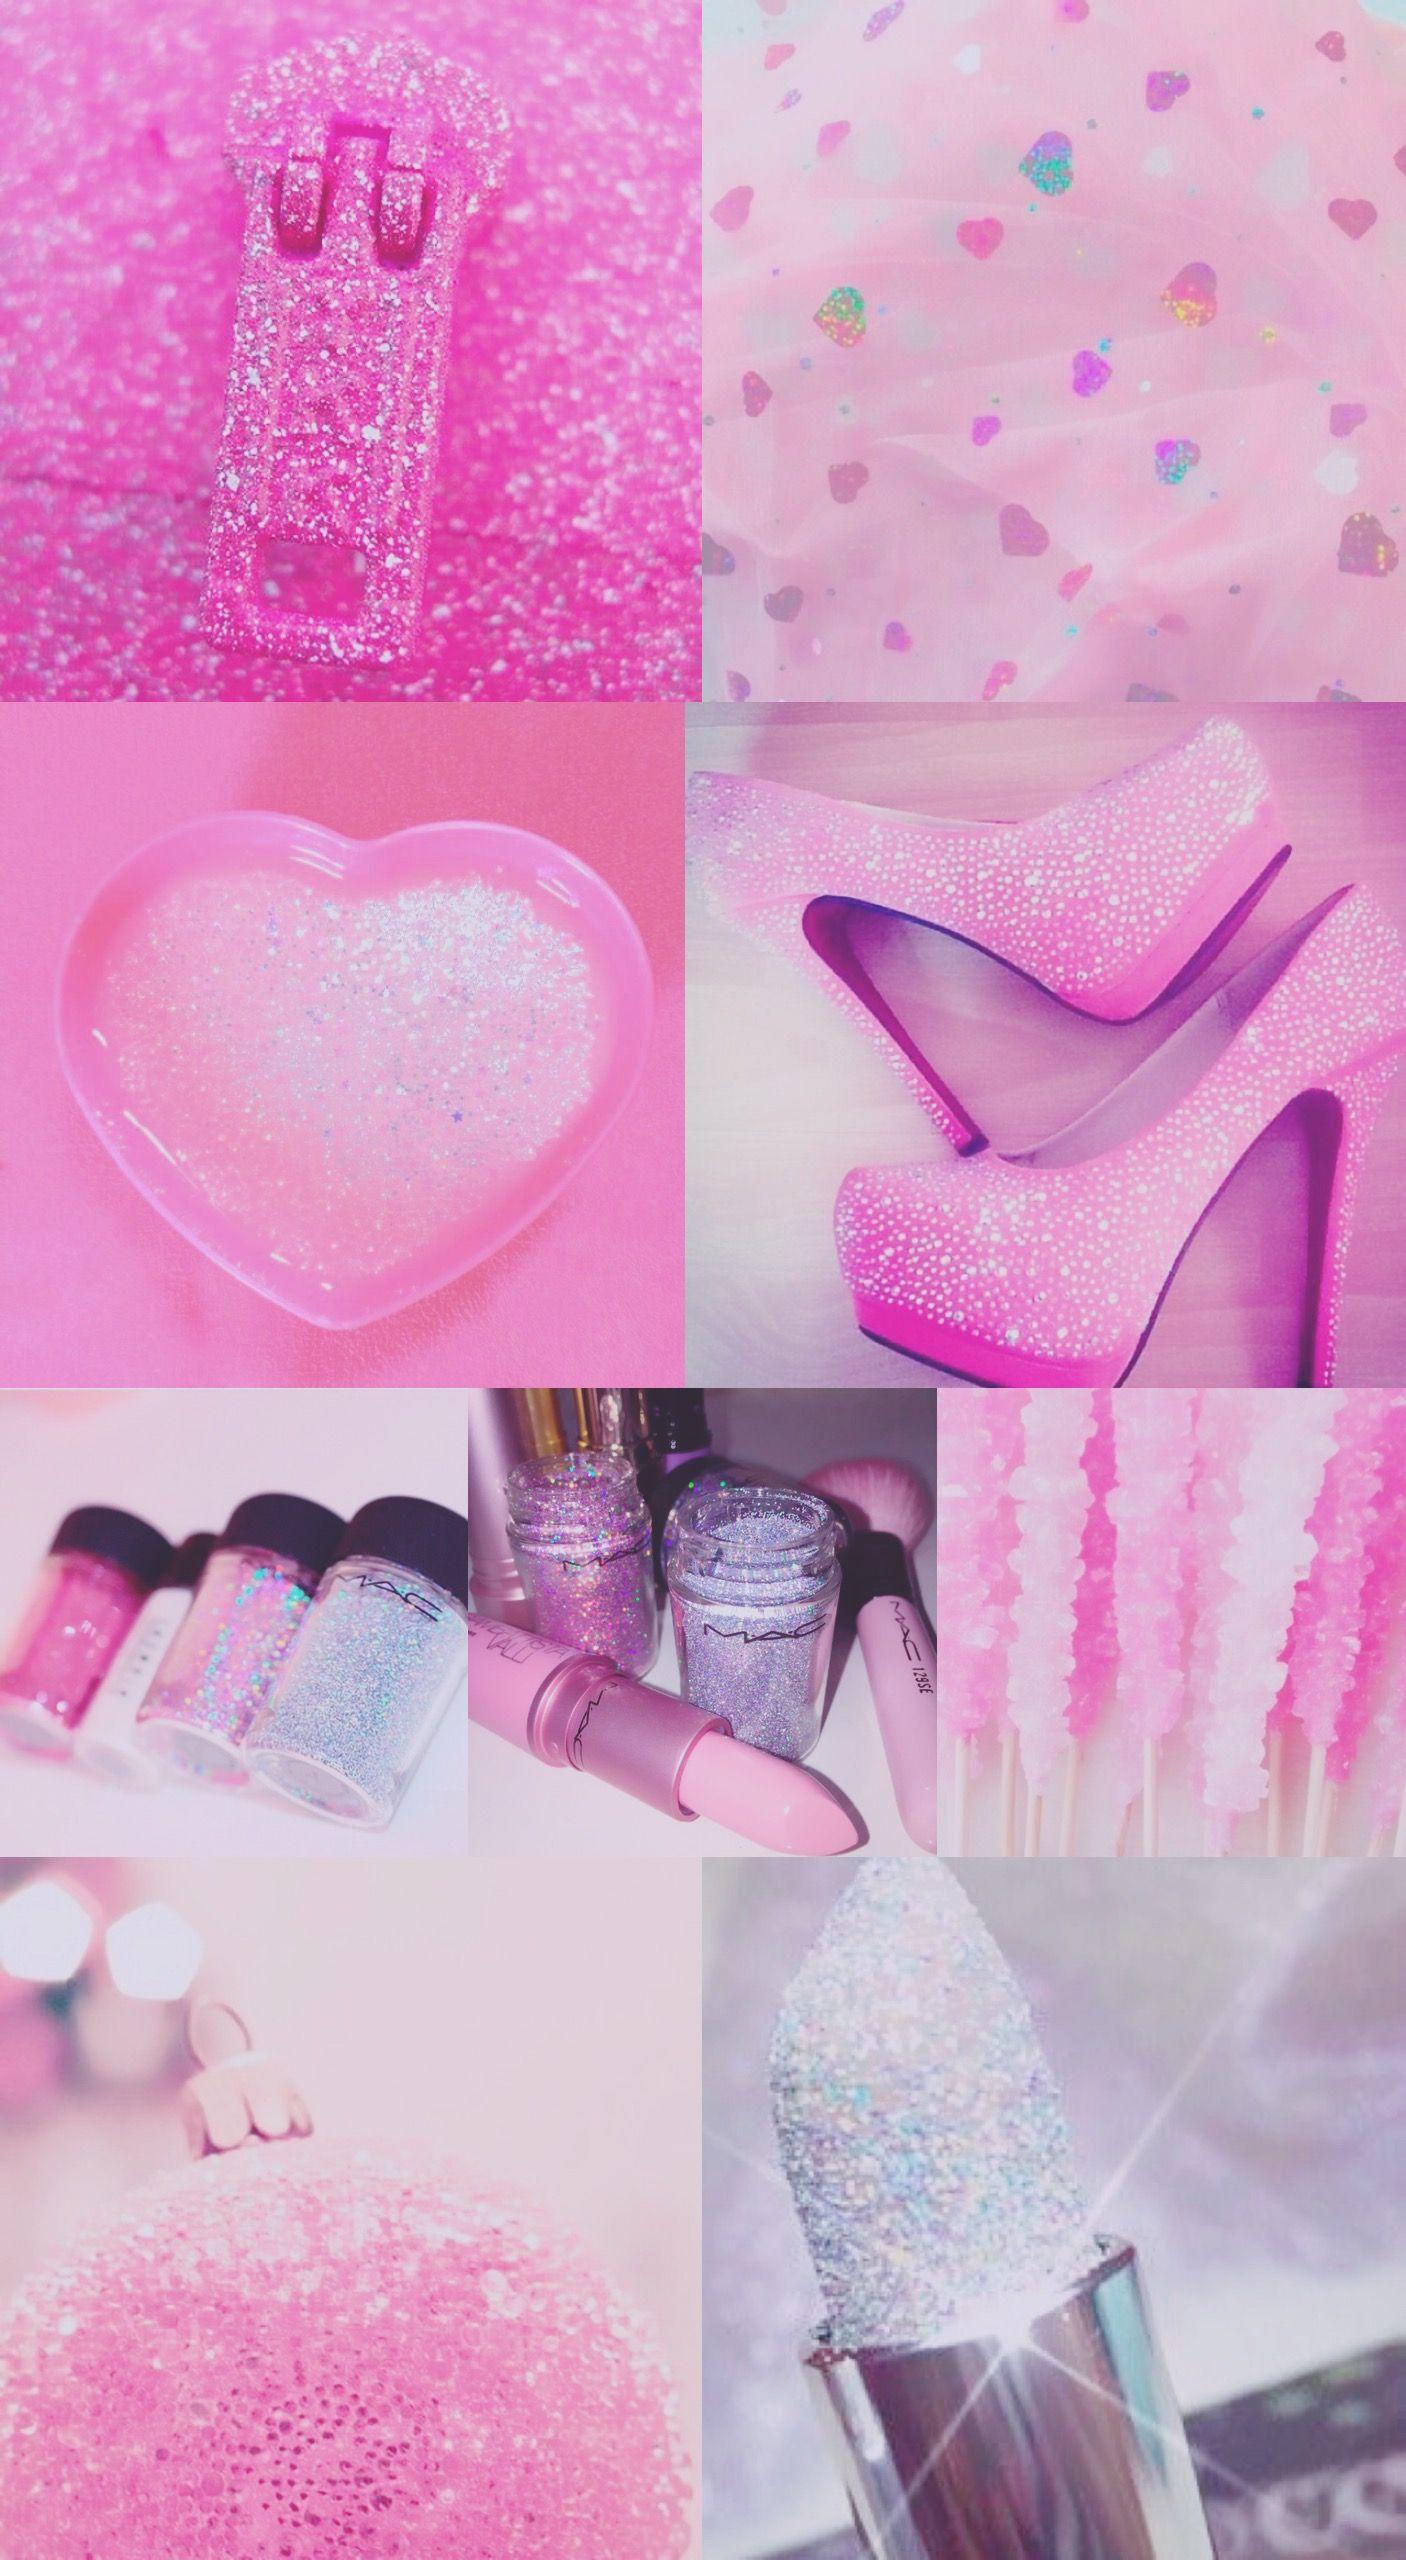 pink, purple, sparkly, glitter, glittery, iPhone